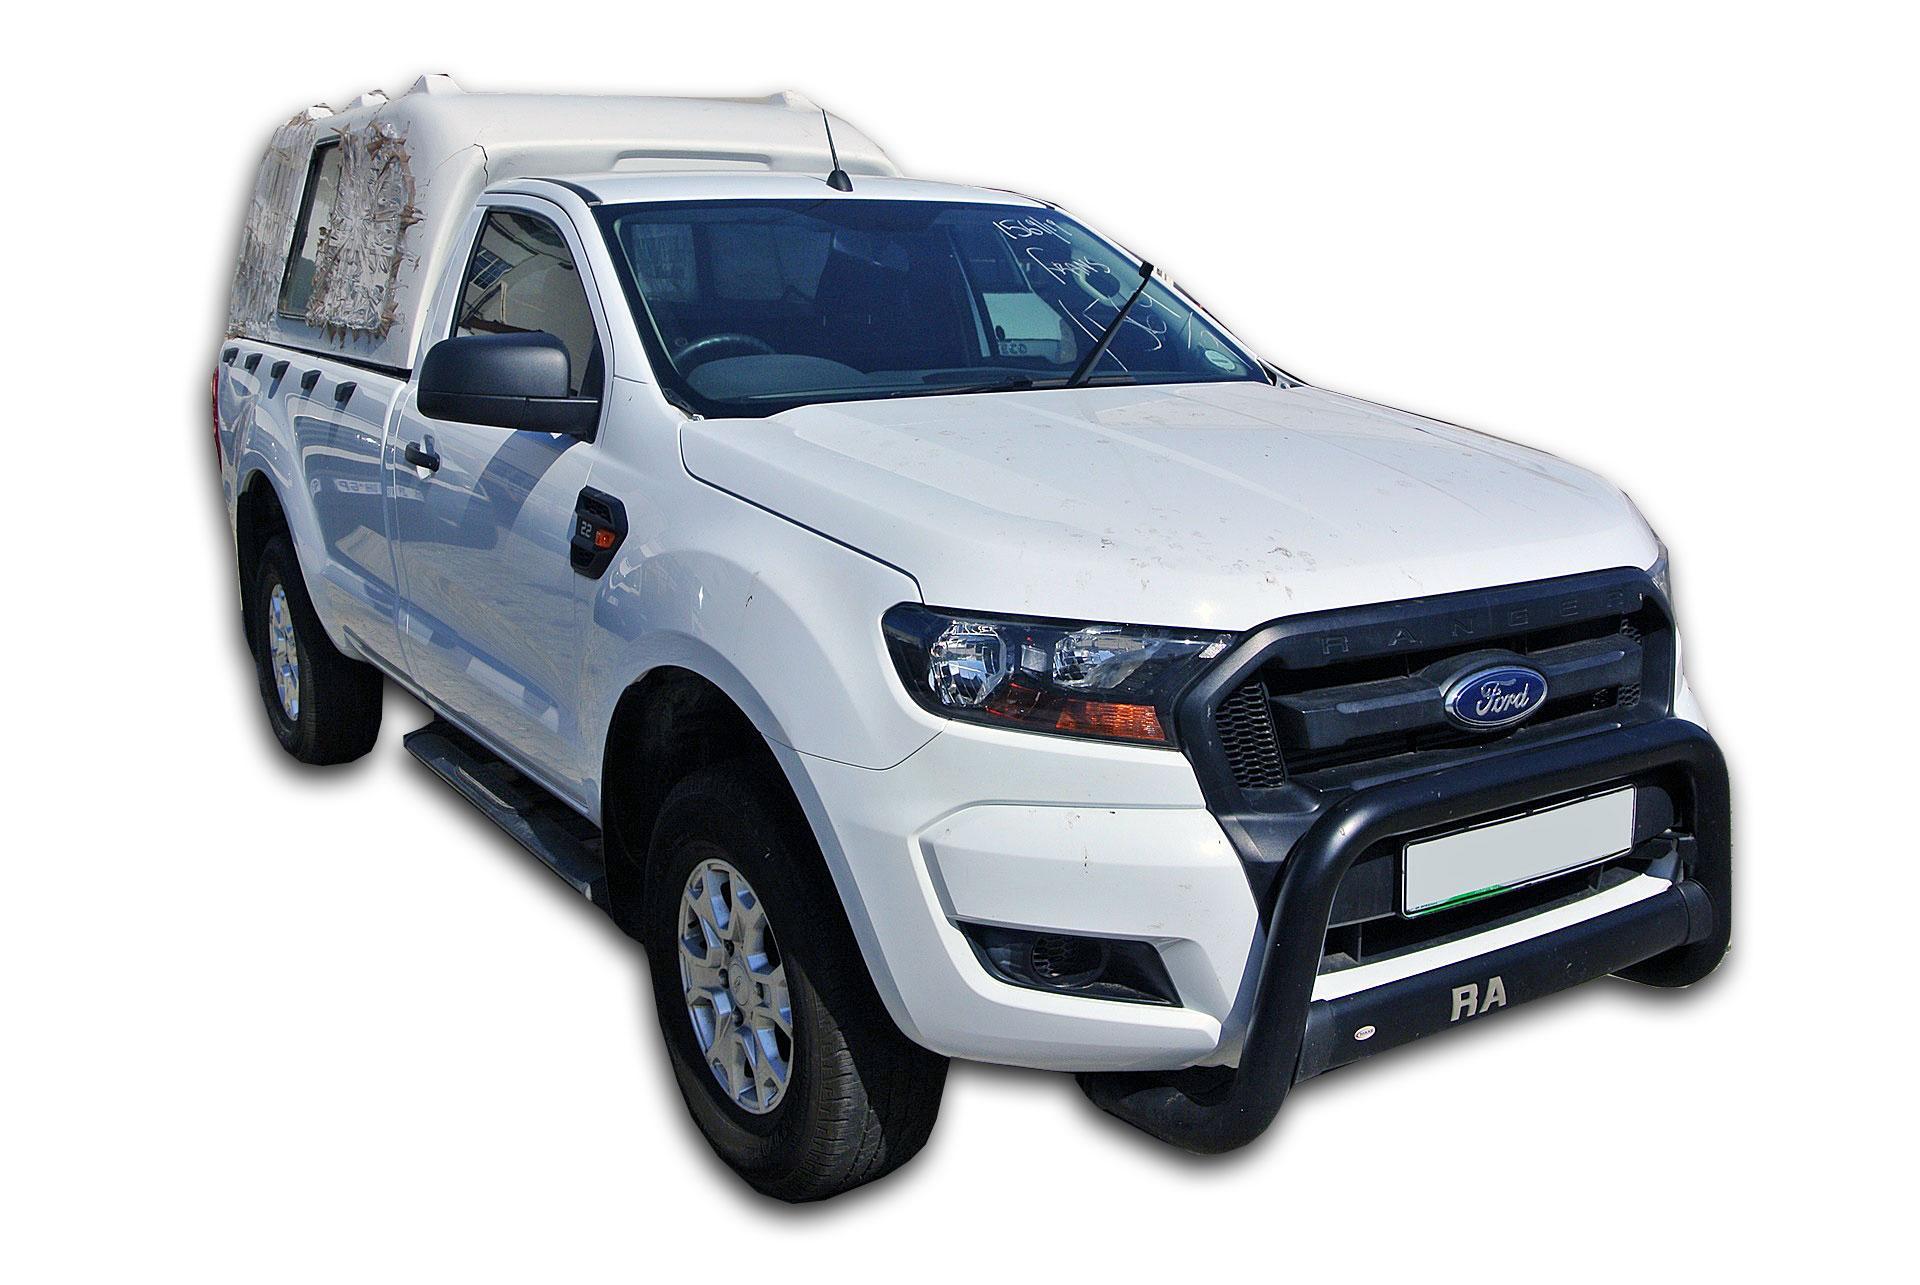 Ford Ranger 2.2 Tdci XL P/U S/C